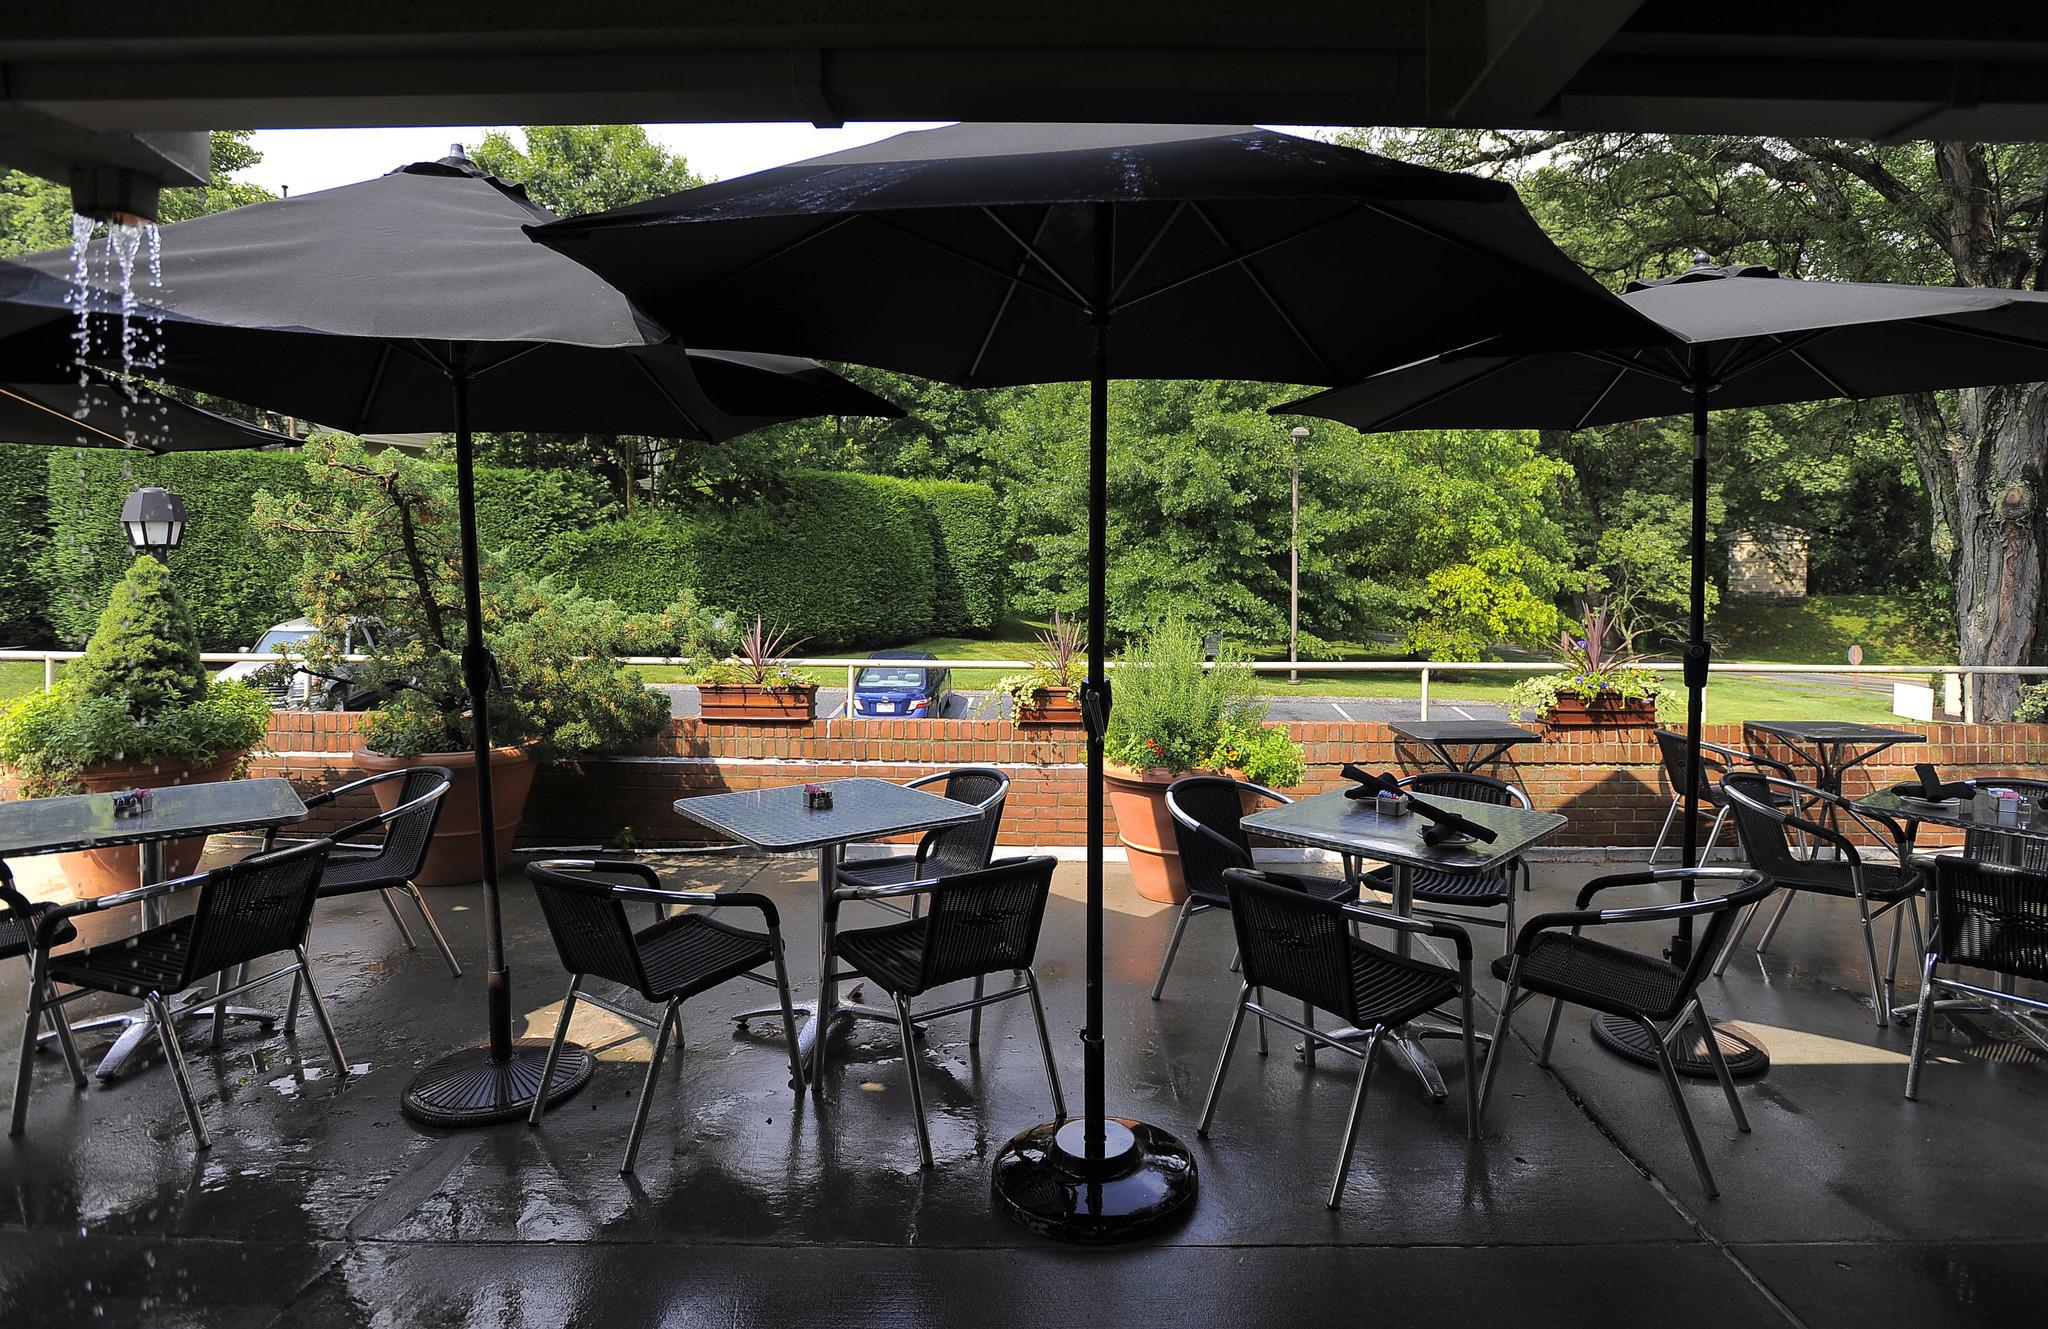 Baltimore Area Restaurant And Bar Closures In 2018 Baltimore Sun